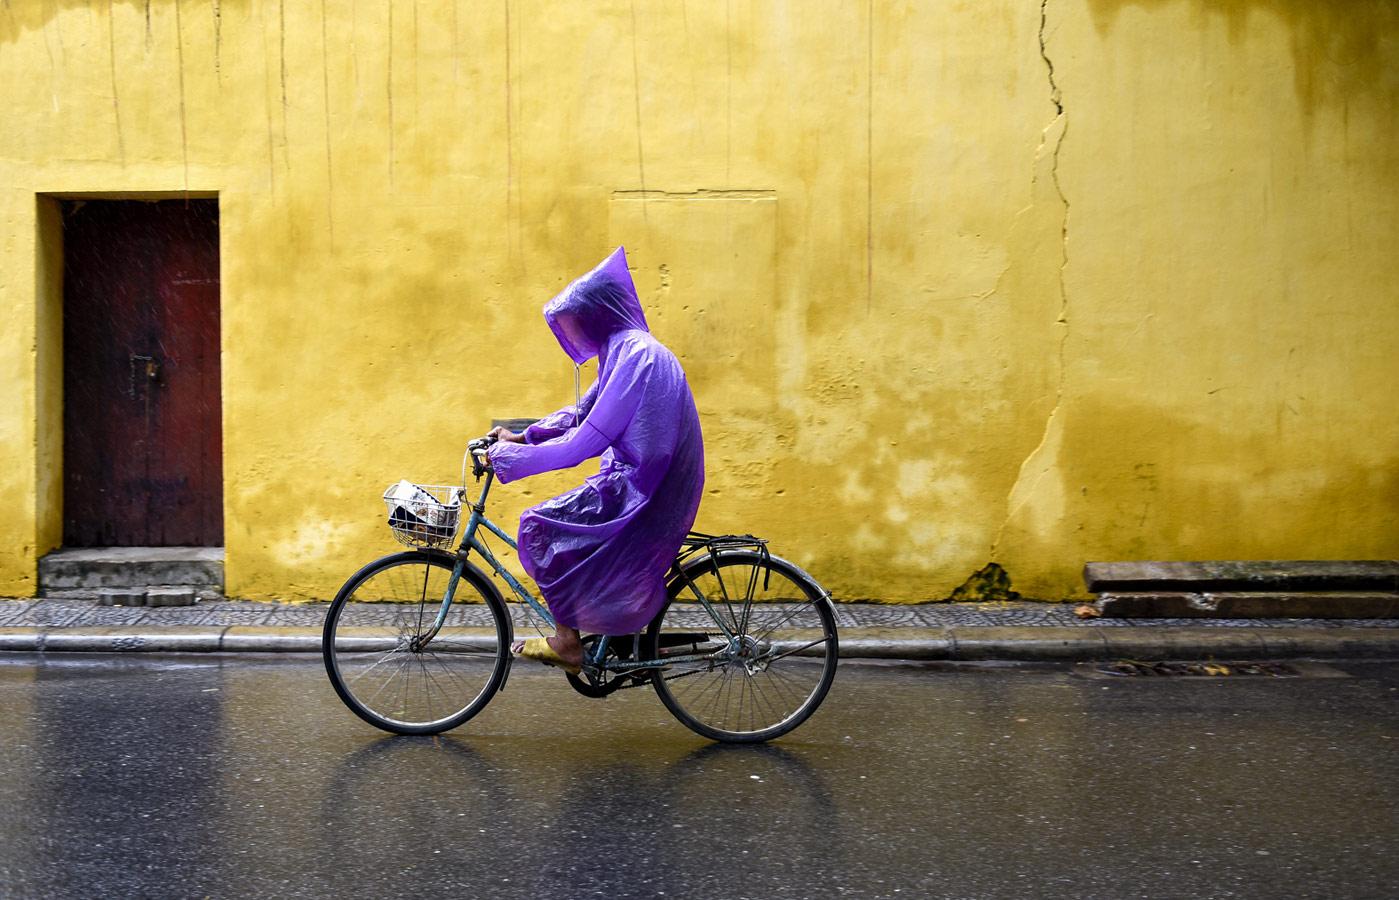 Тема: Путешествия, июнь 2017, © Кэтрин Маттис, Фотоконкурс «Независимый фотограф» — The Independent Photographer